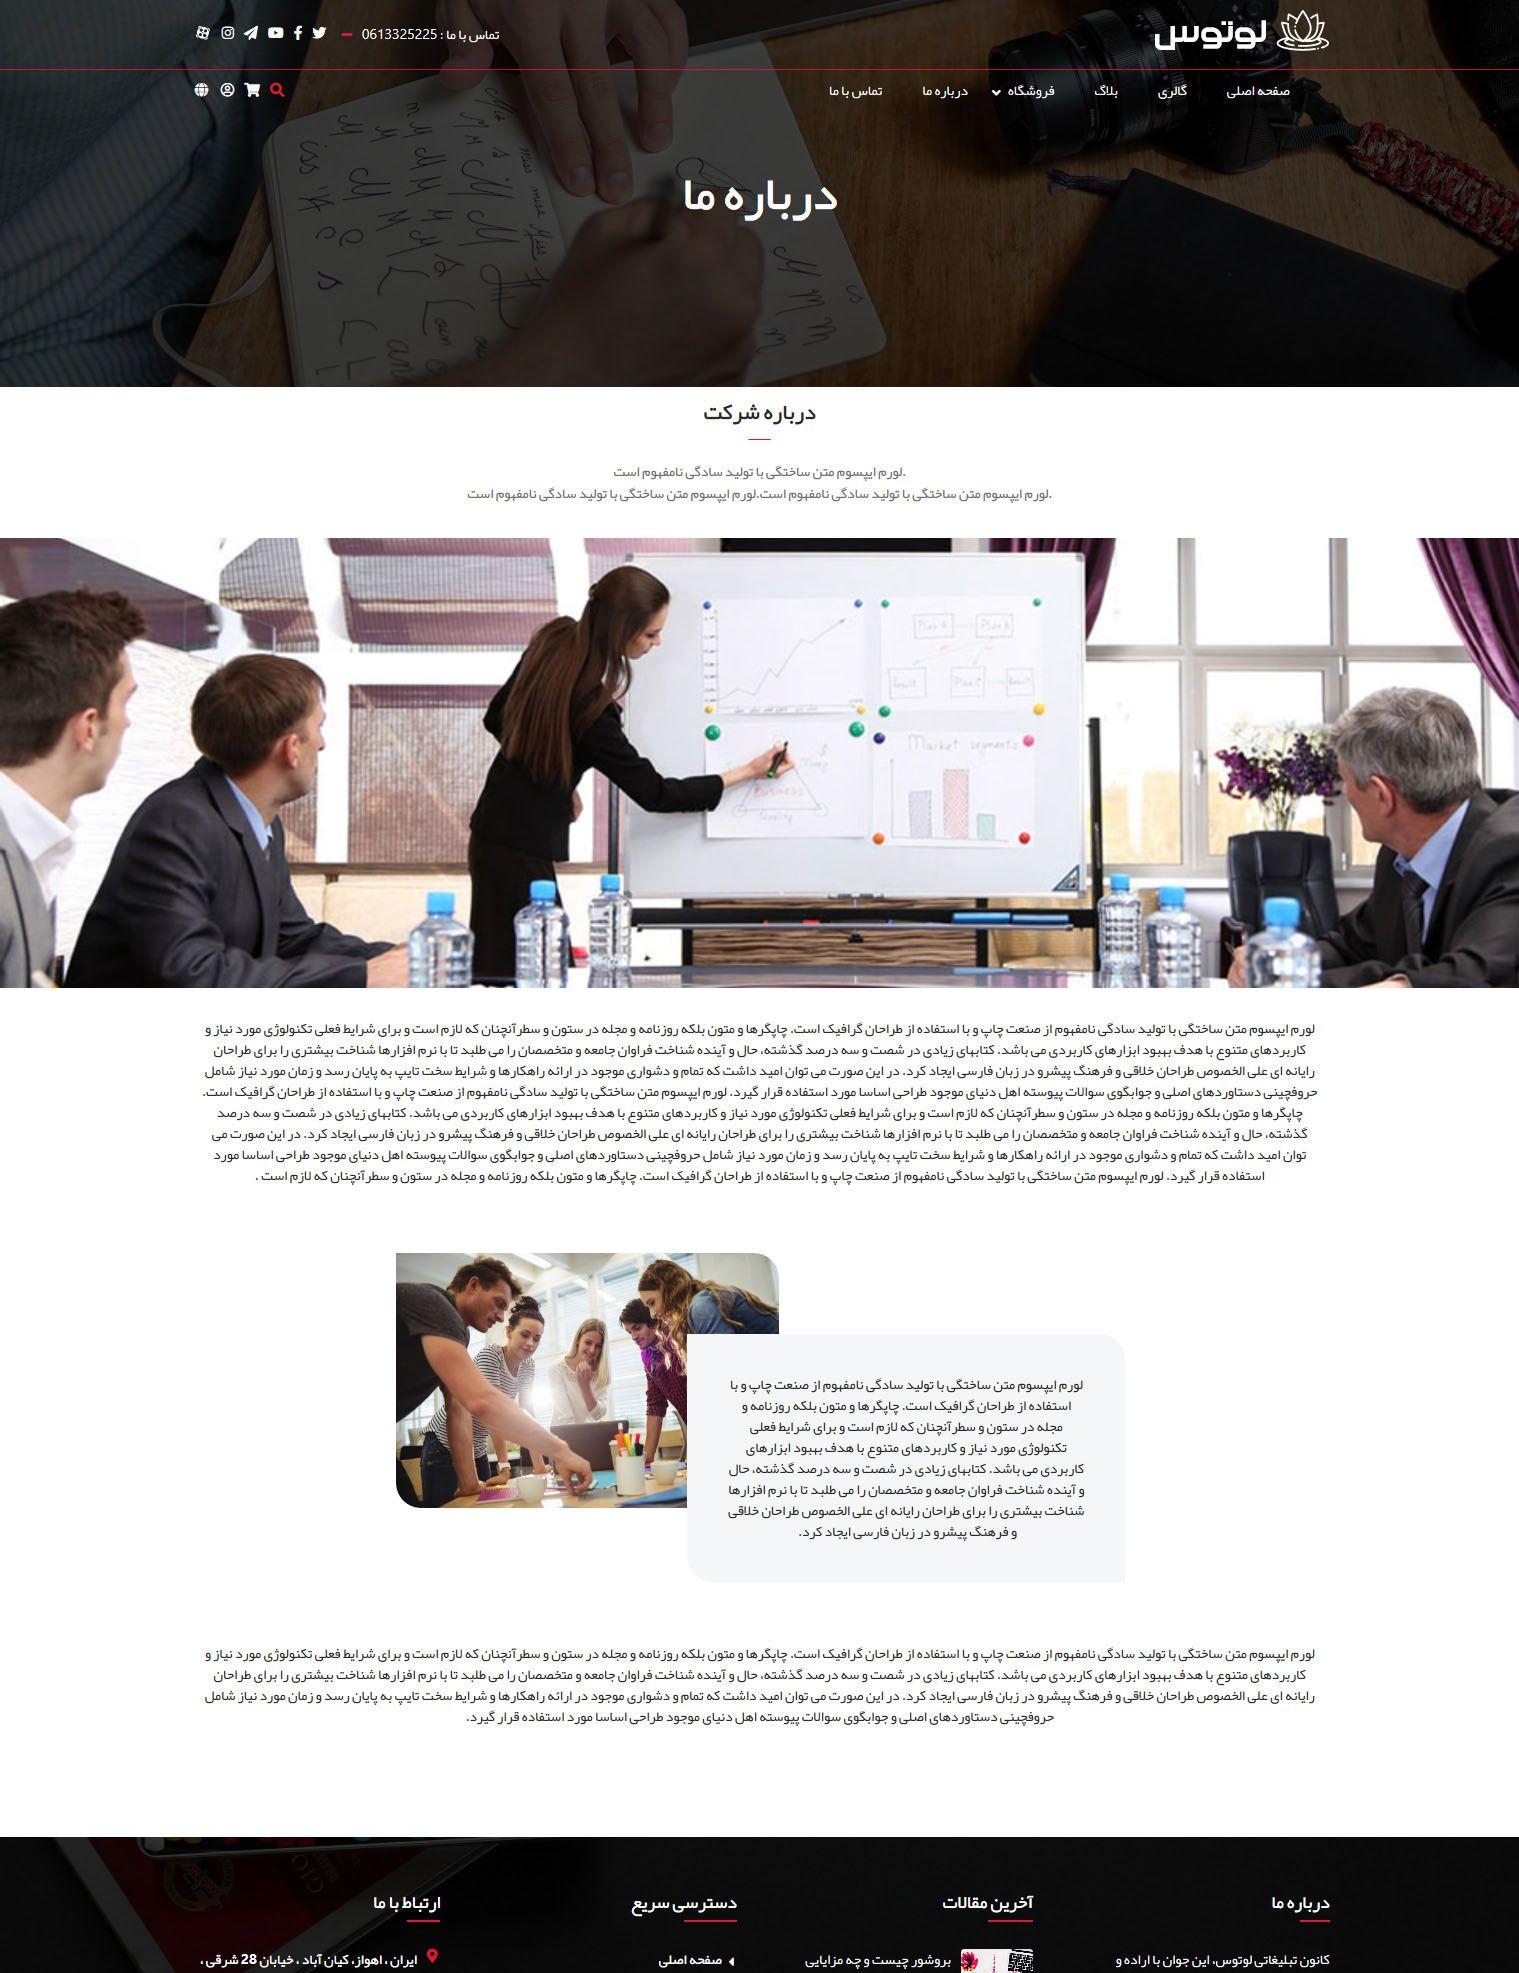 Screenshot 2020 01 13 درباره ما – قالب شرکتی لوتوس